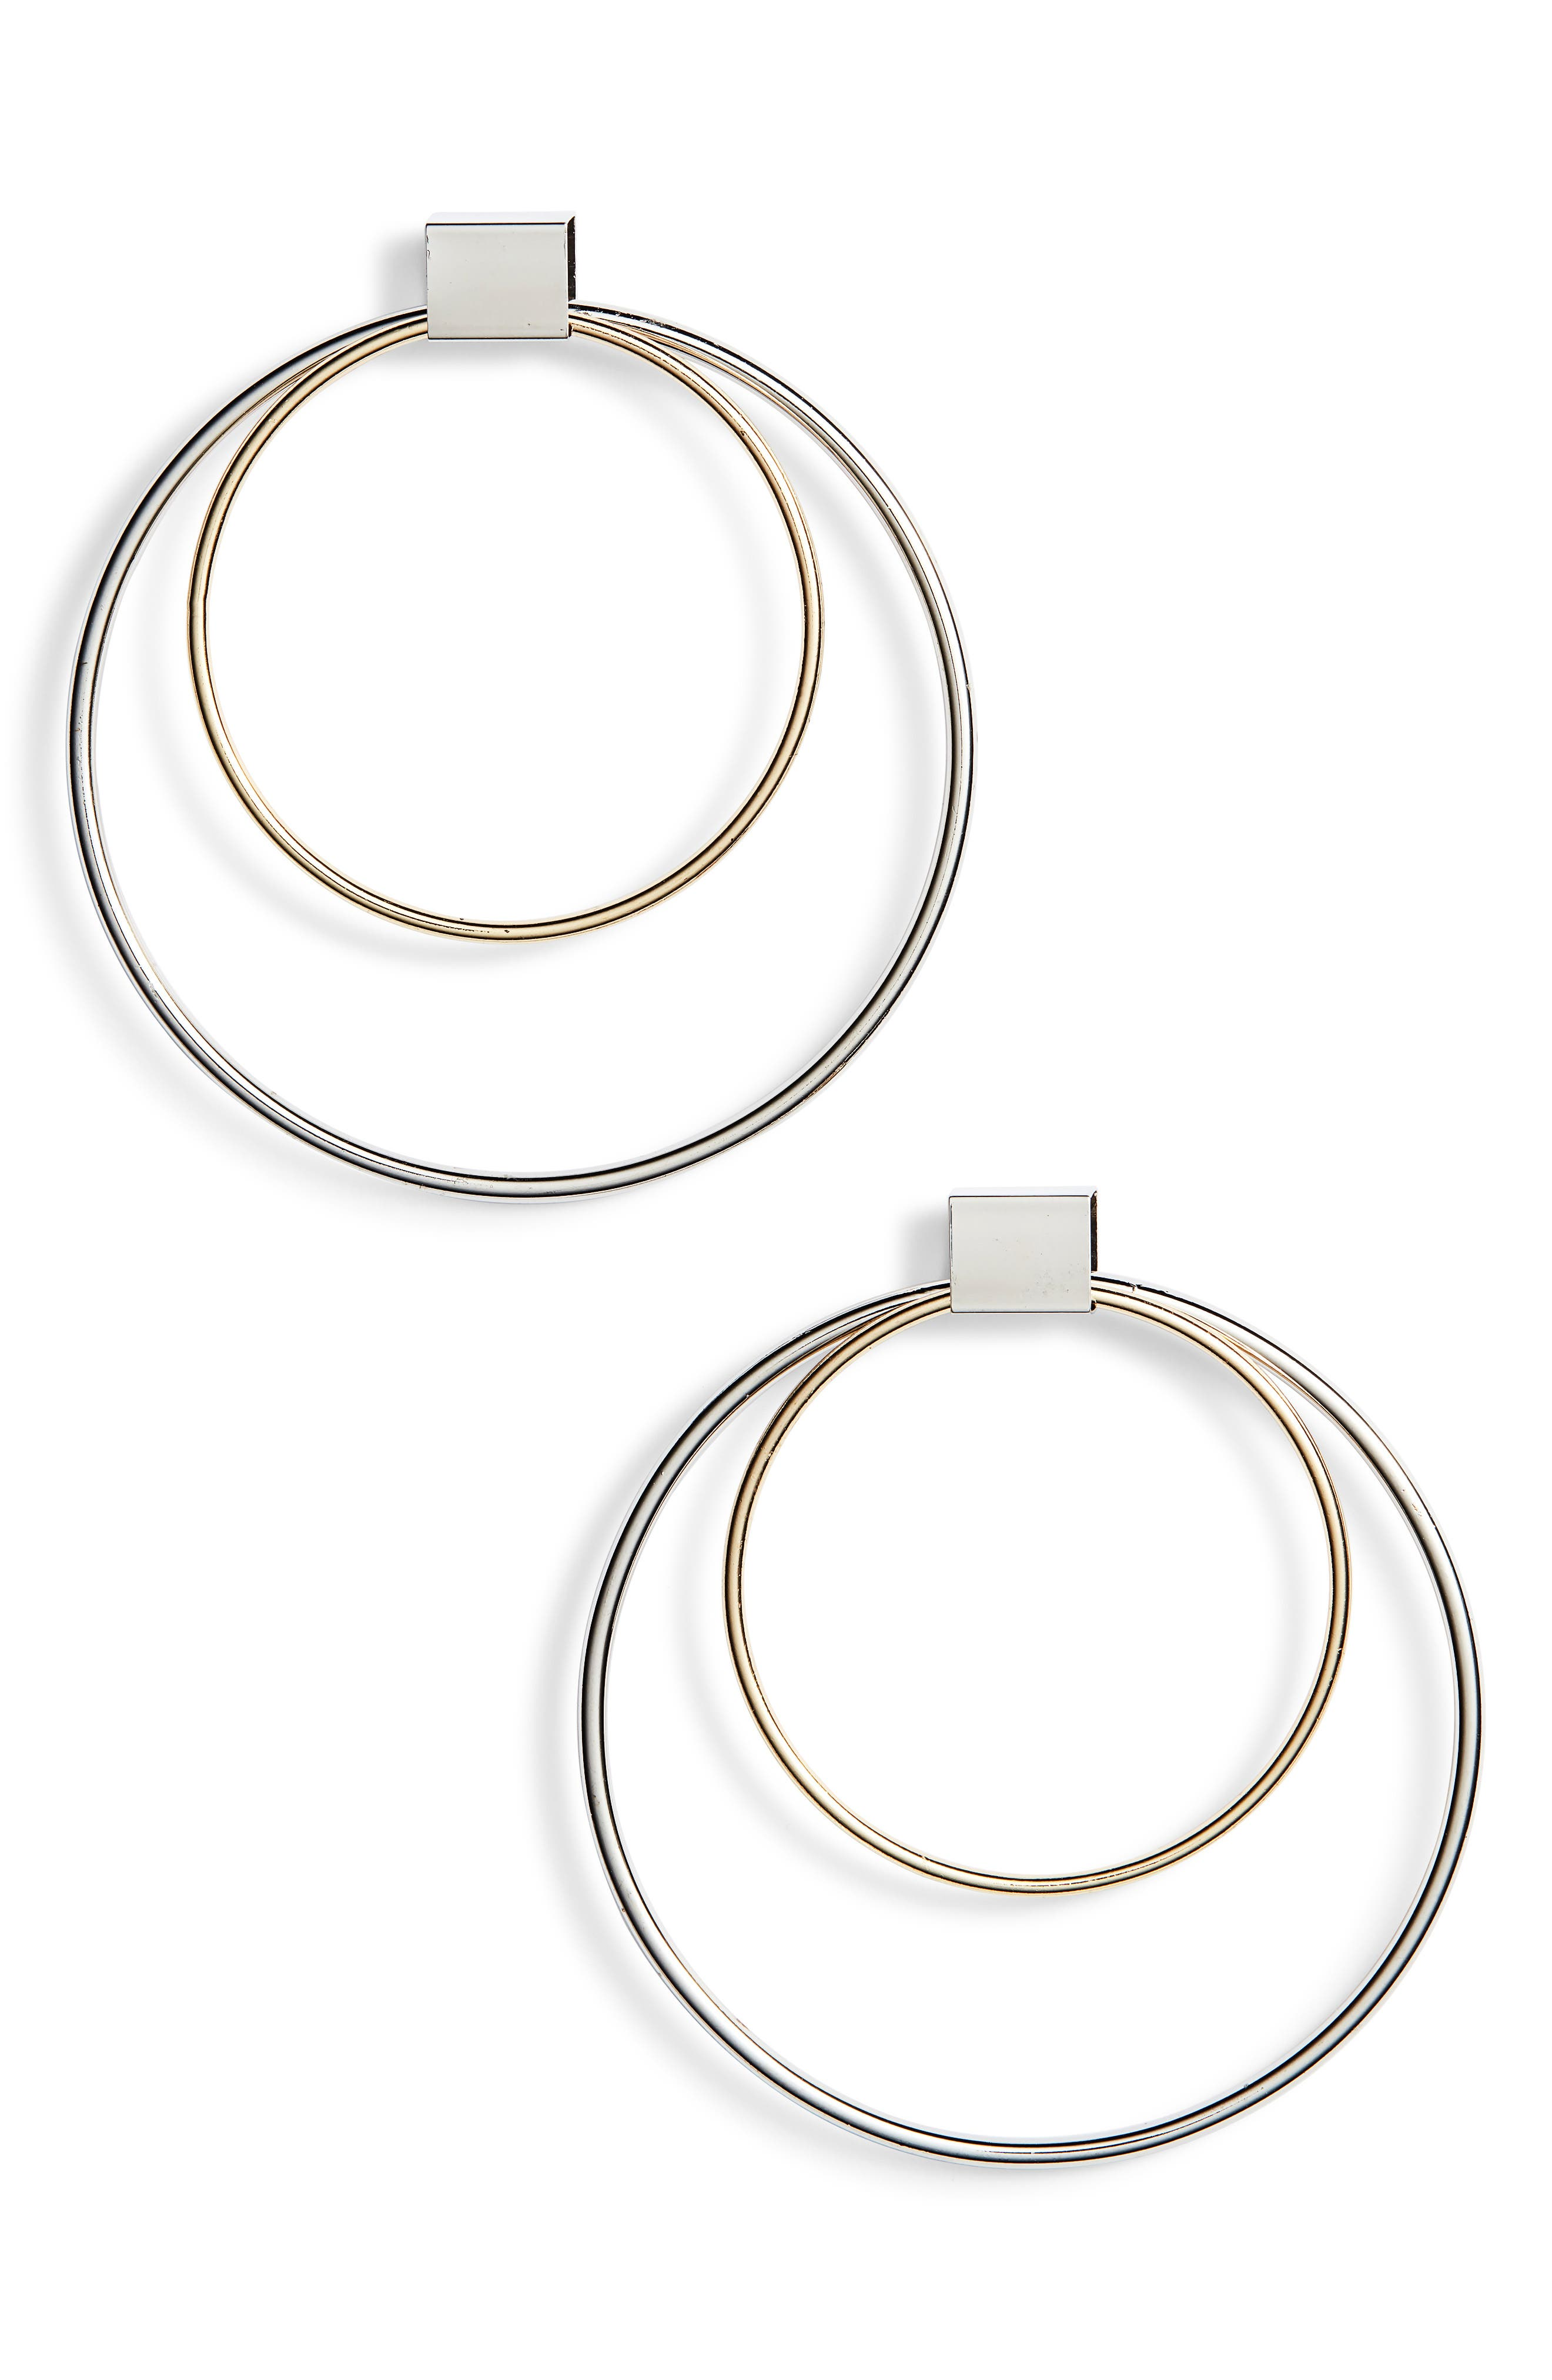 Double Hoop Earrings,                         Main,                         color,